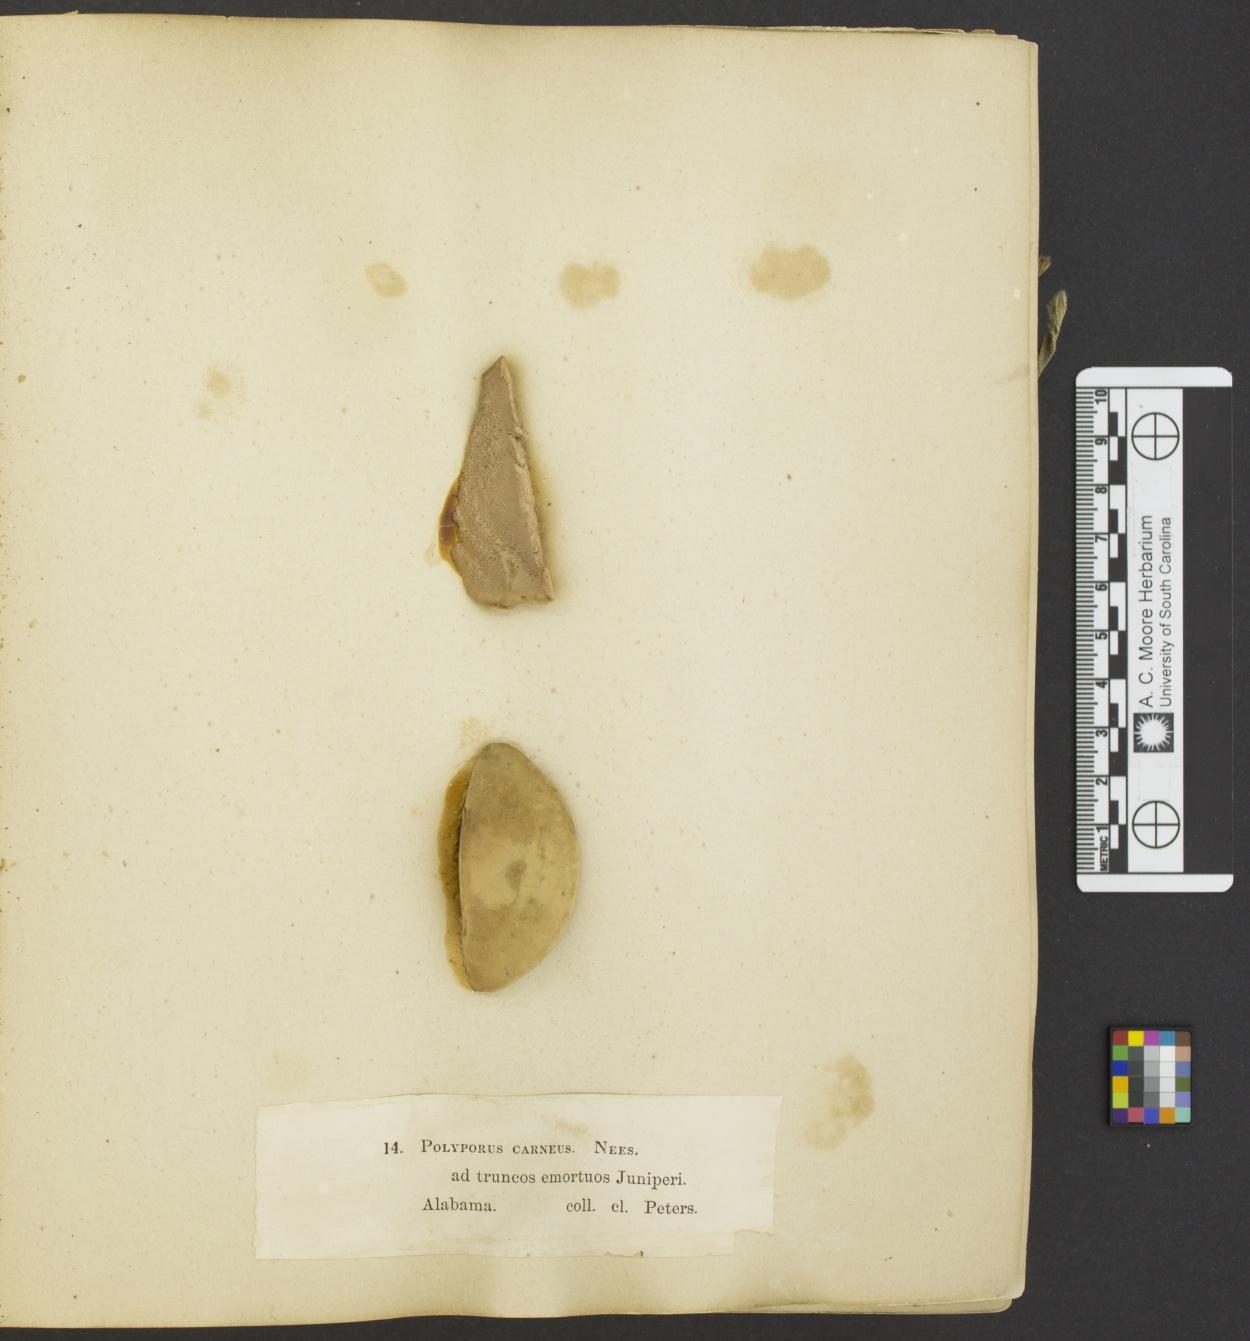 Polyporus carneus image